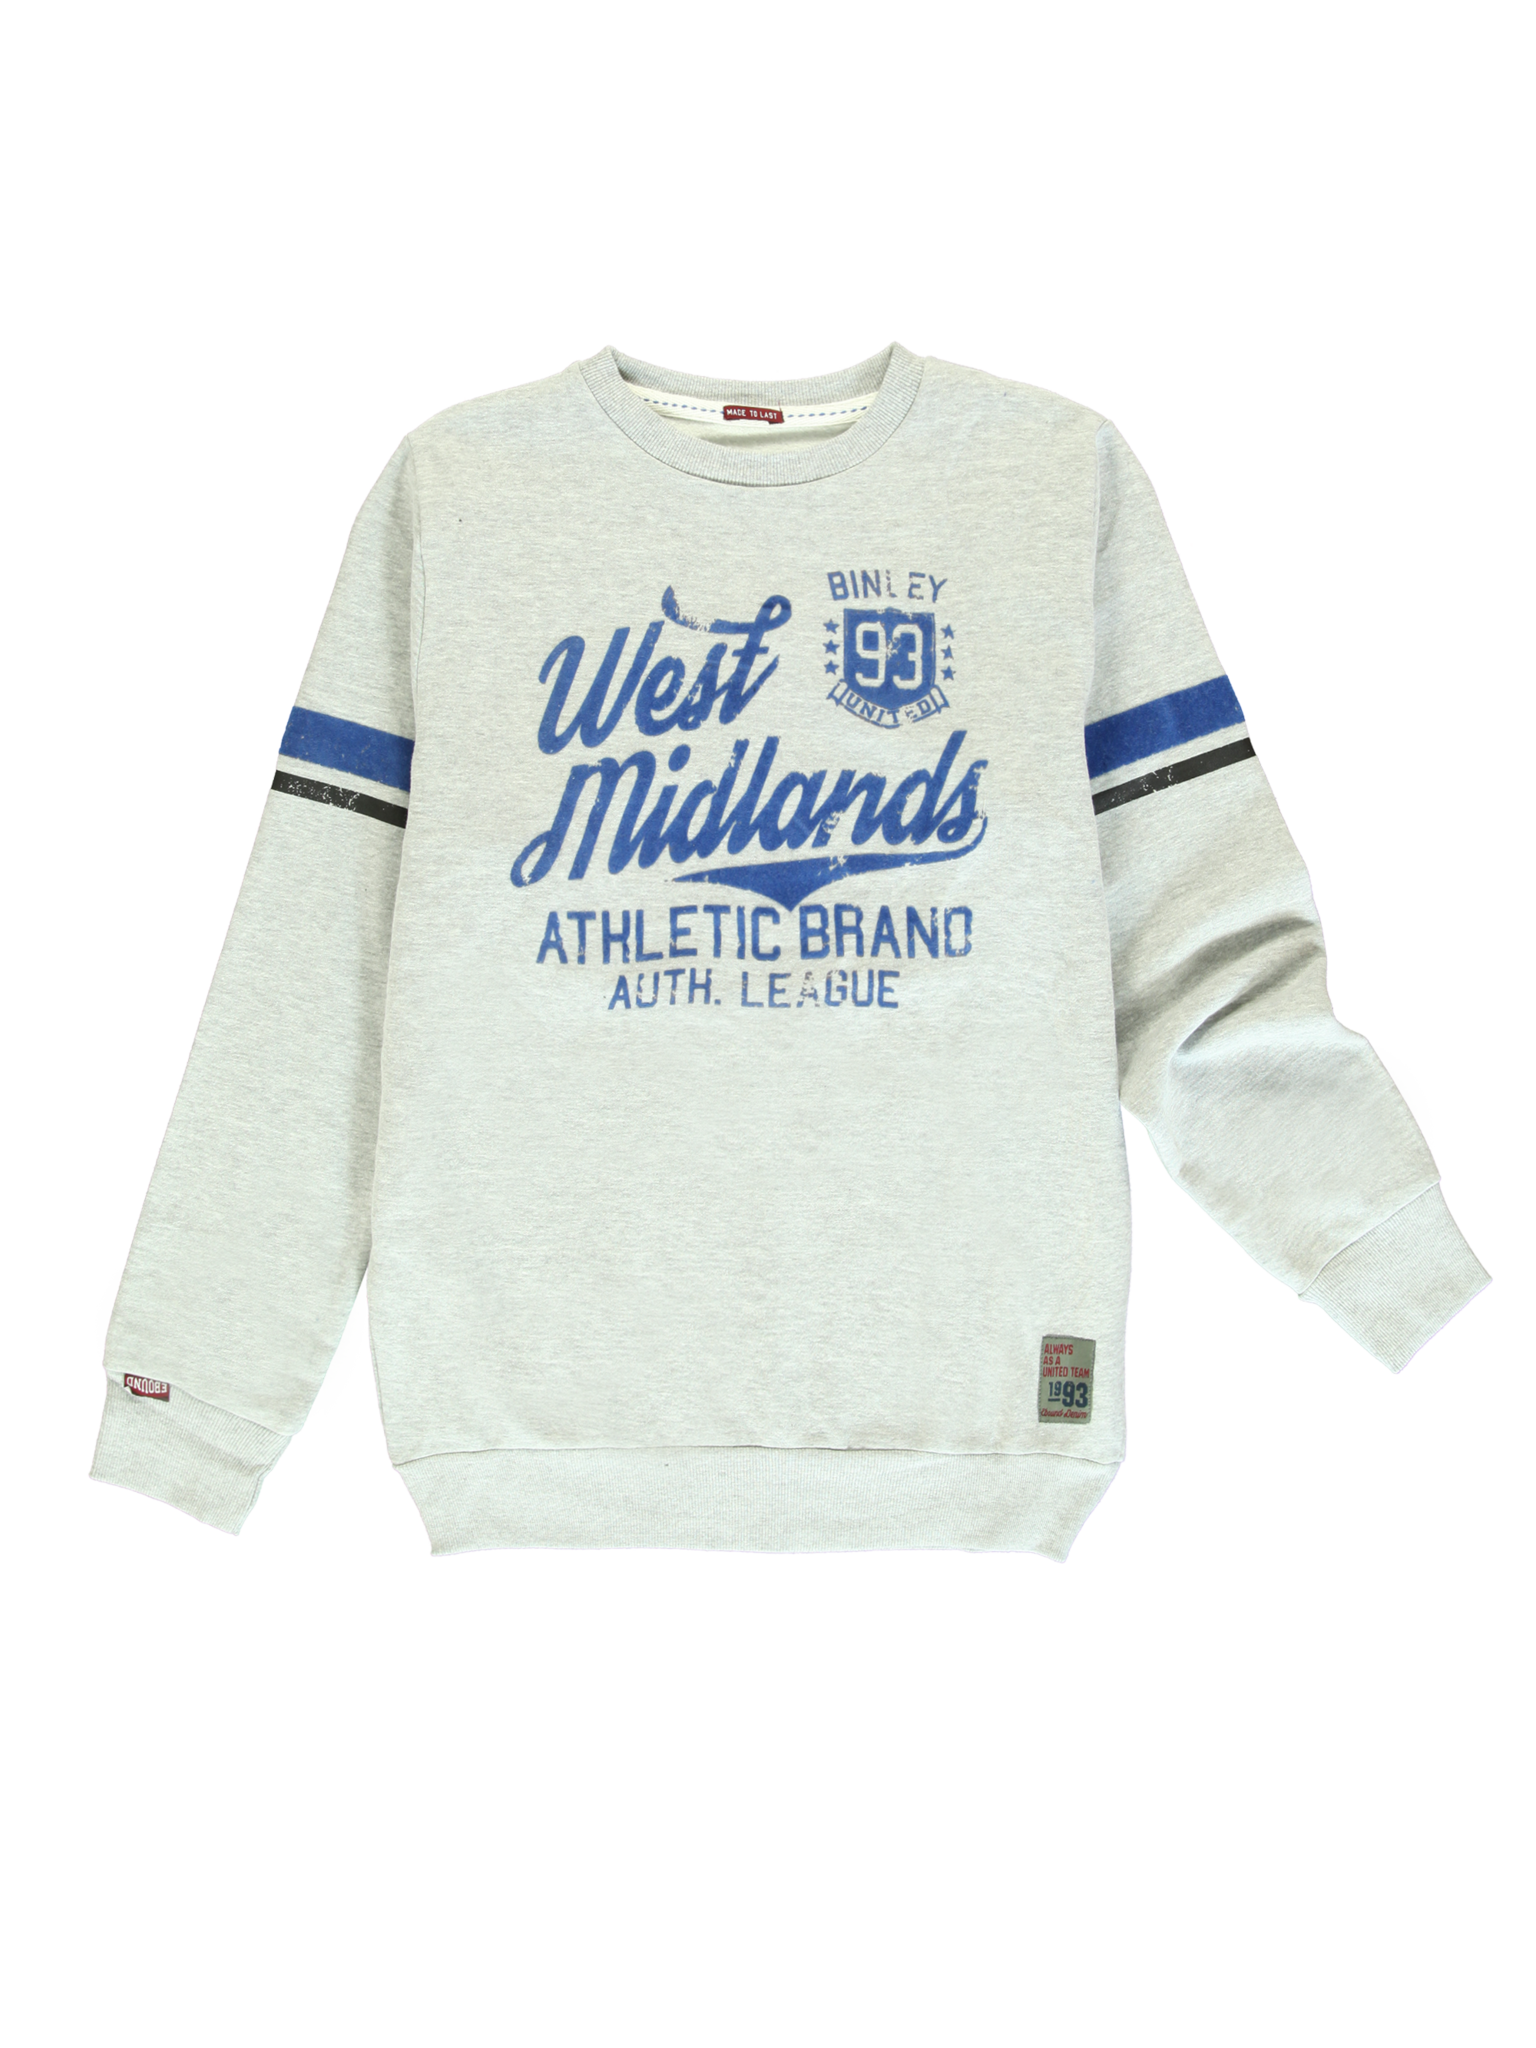 All Brands | Winterproducts Men | Sweatshirt | 12 pcs/box